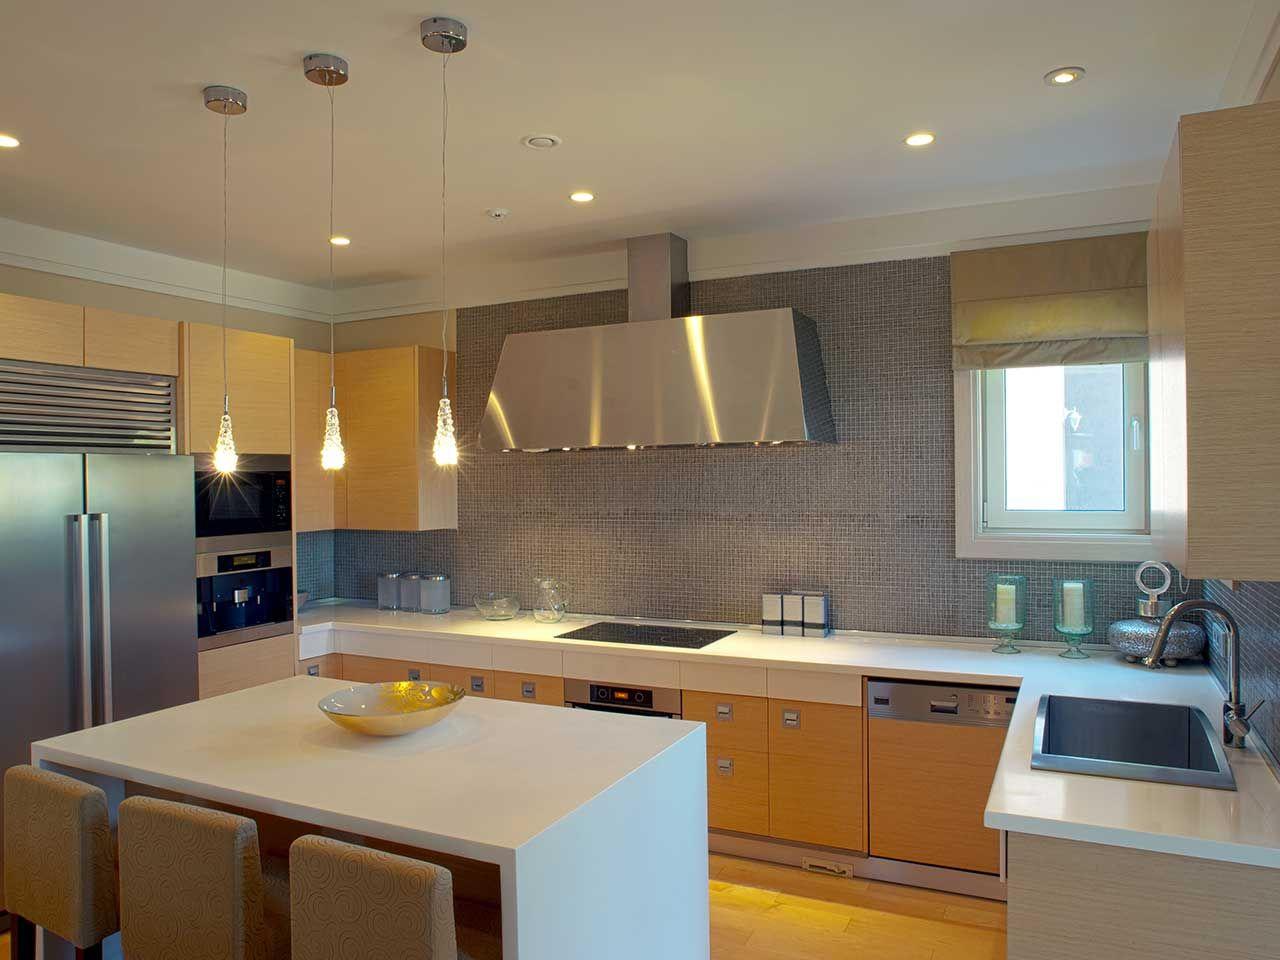 Pin By Pankaj Singh On Luxury Housing In India Kitchen Lighting